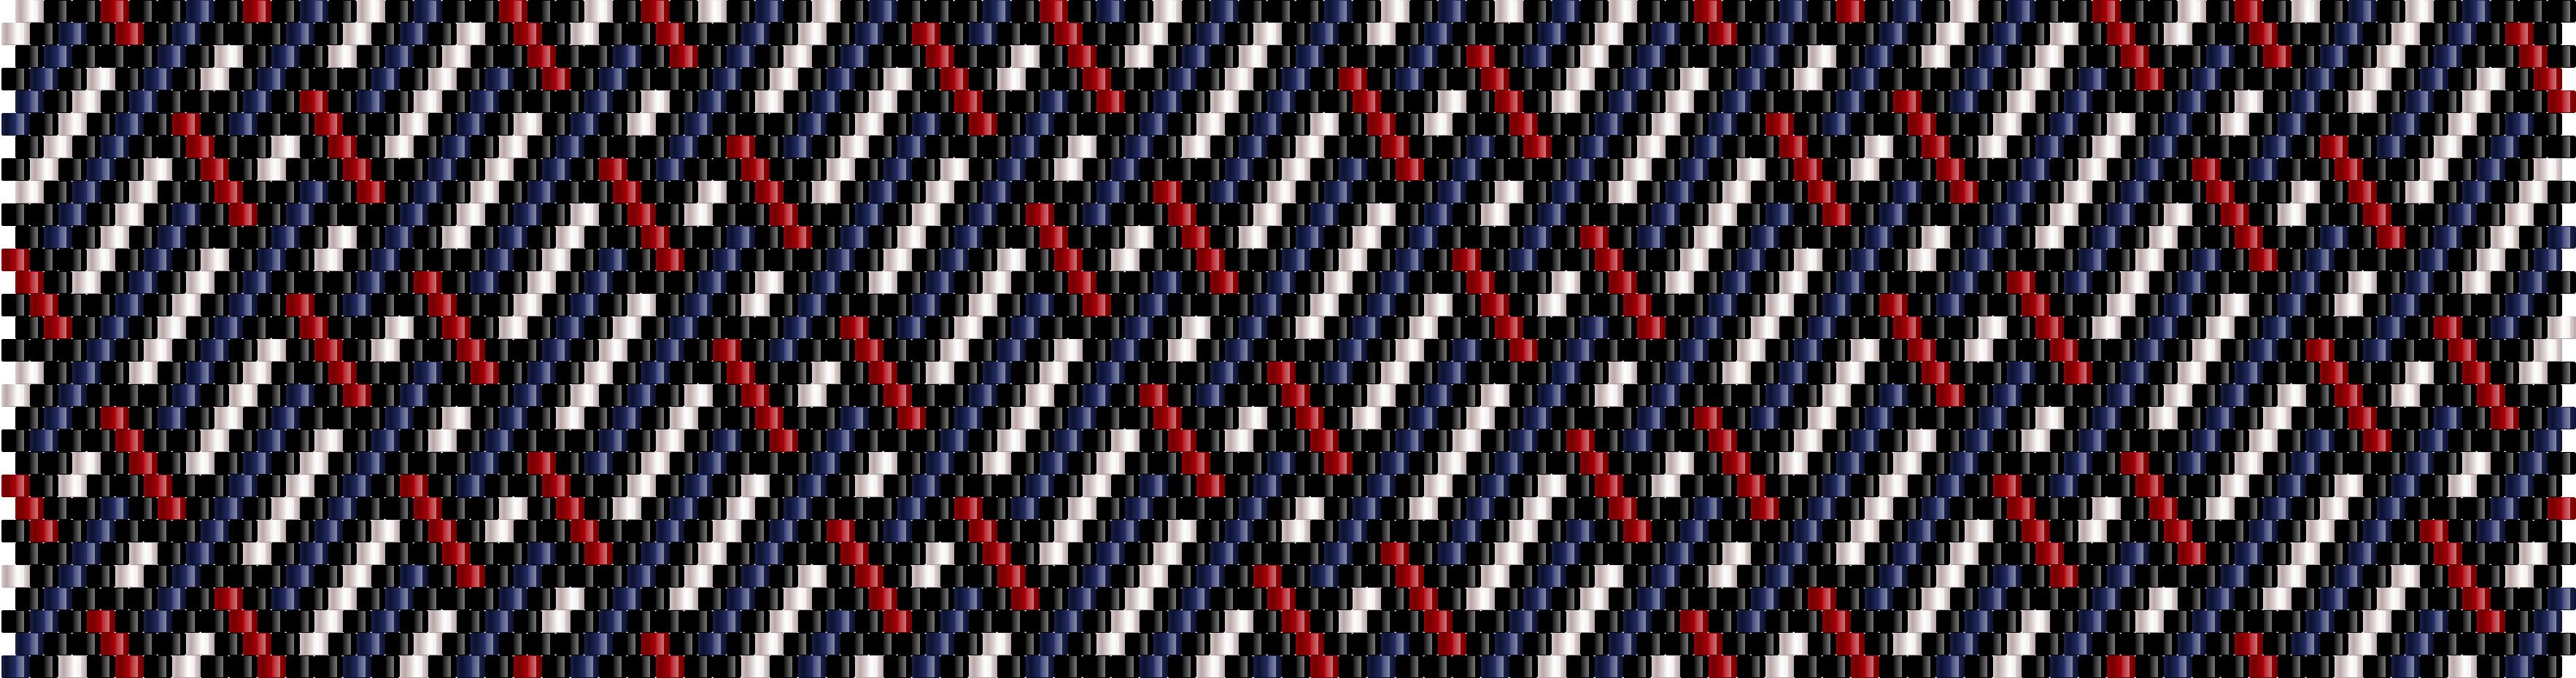 Interweaving lines – free pattern